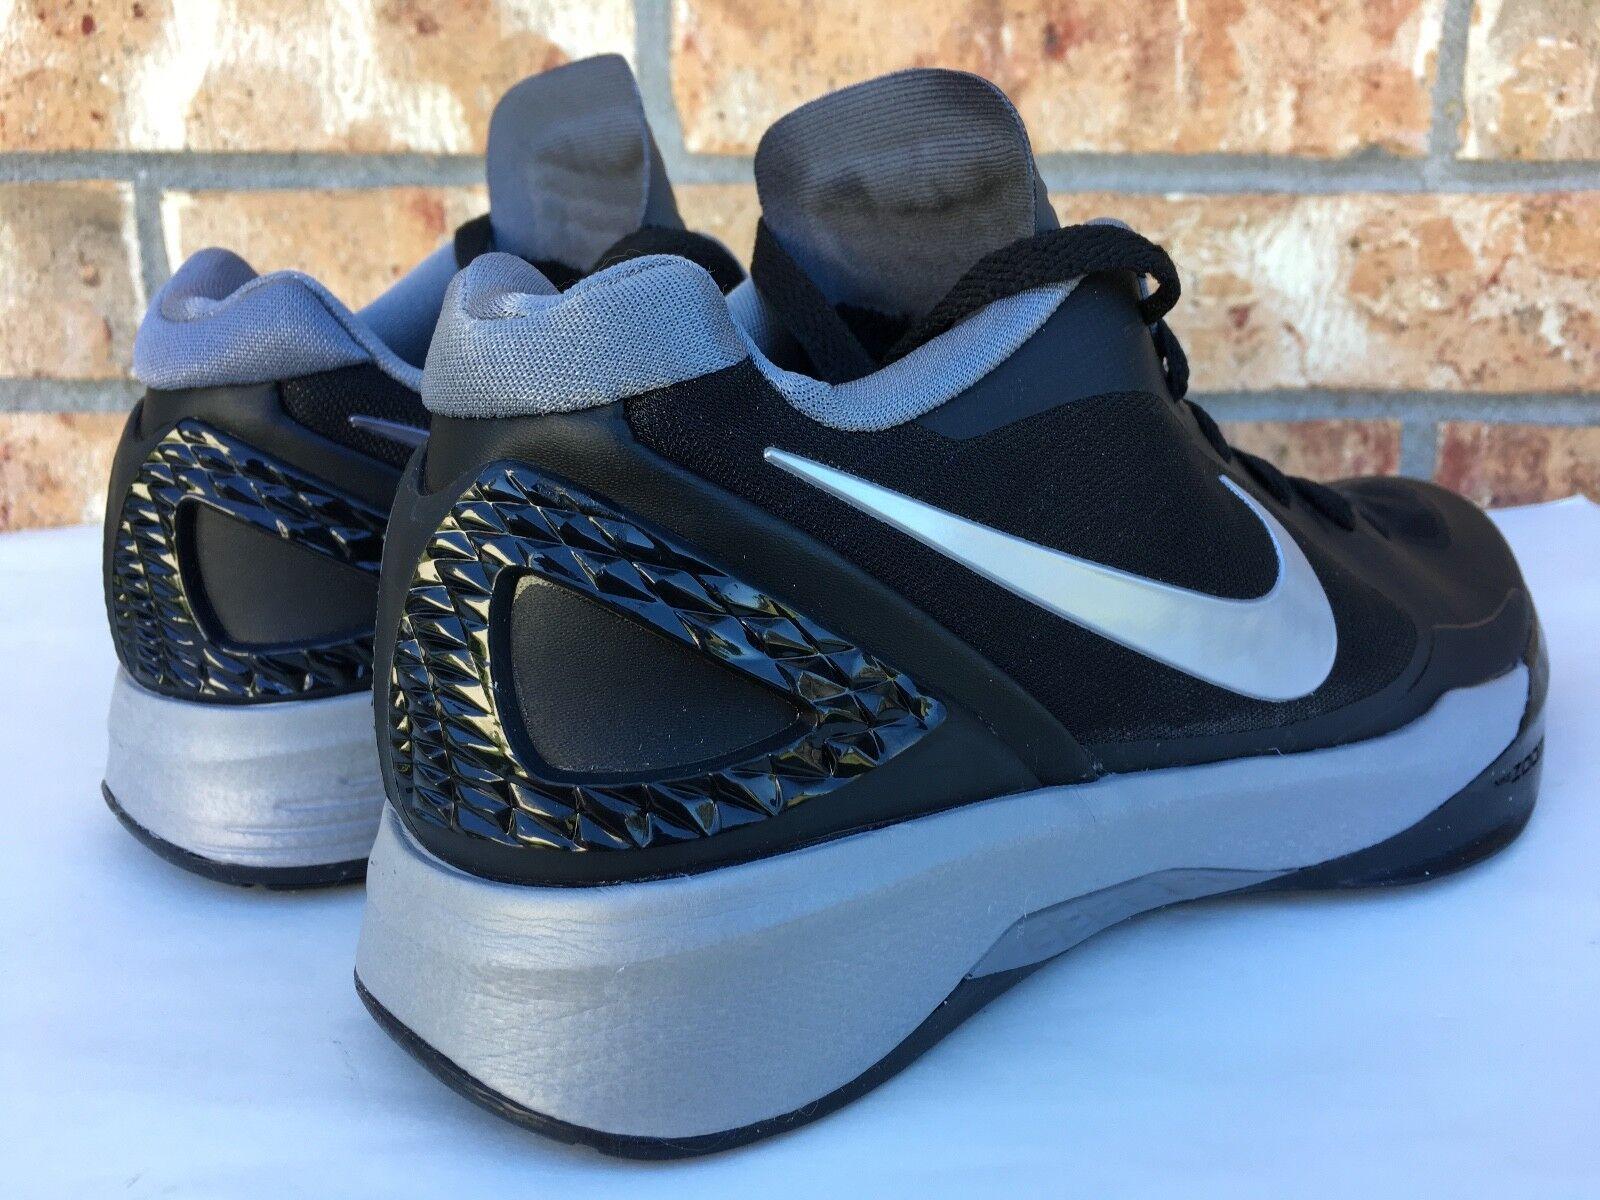 Donna  Nike Nike Nike Zoom Volley Hyperspike Volleyball scarpe Dimensione 5 -14 585763 001 f5d4b6